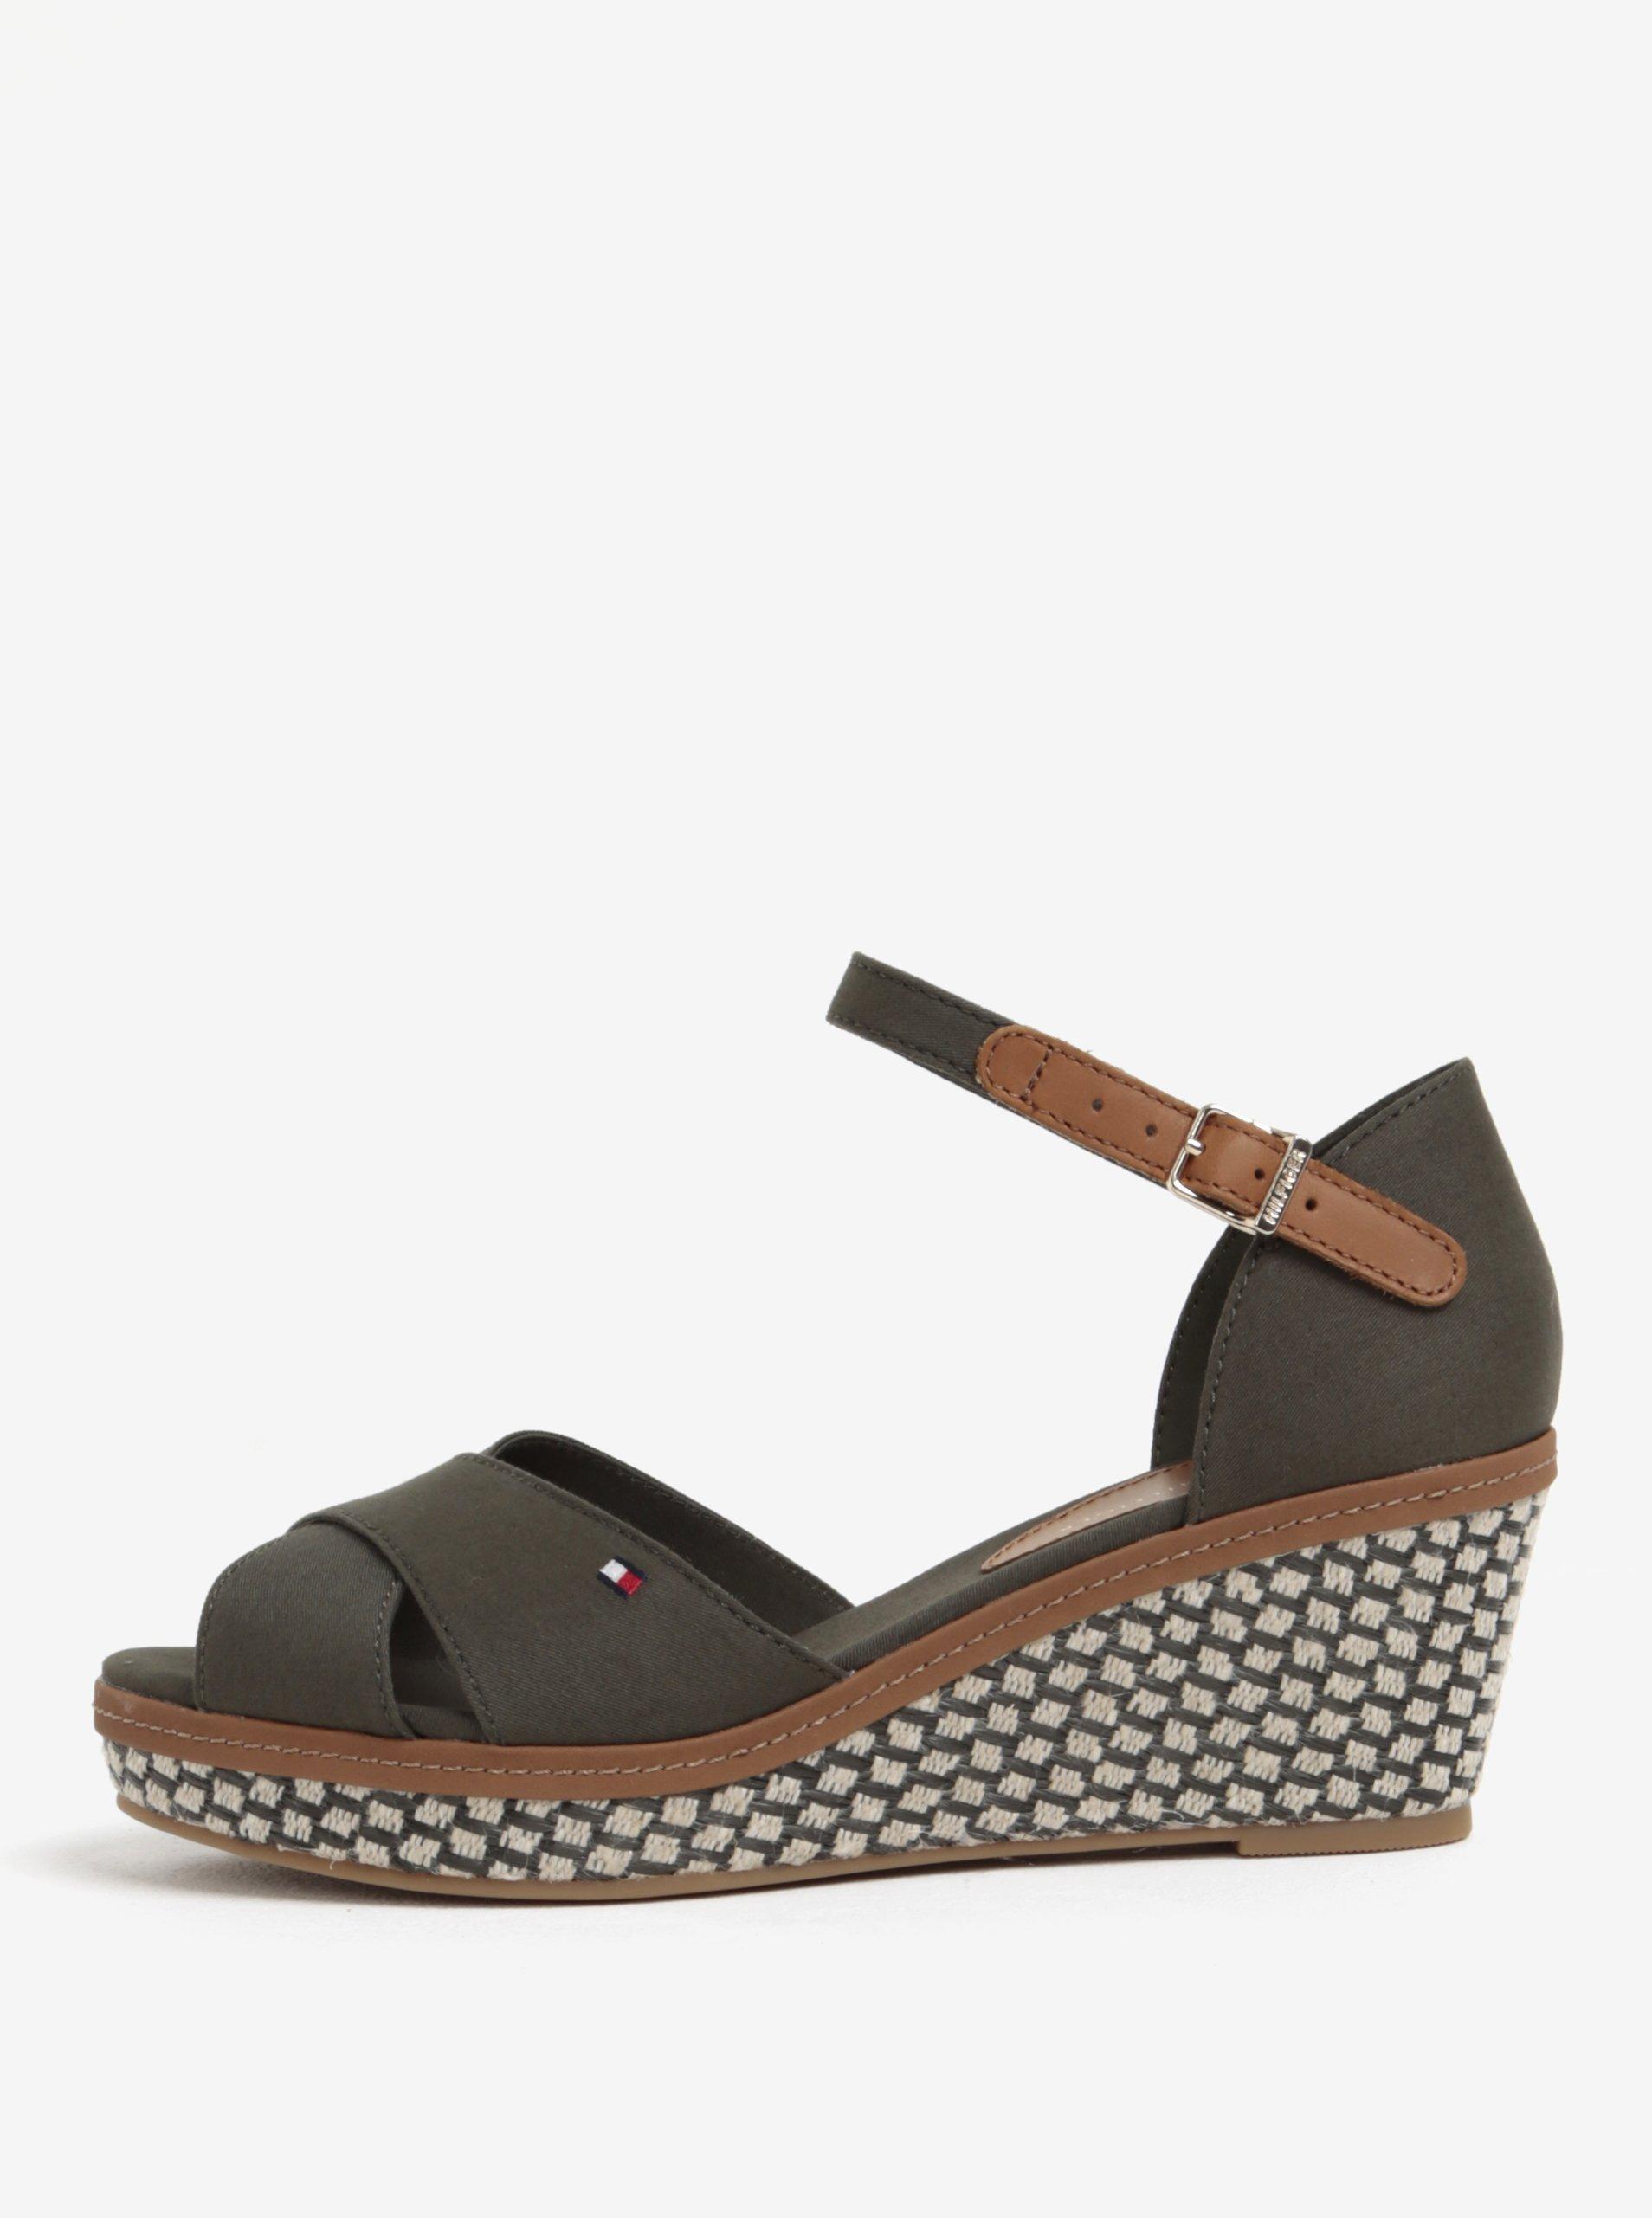 c3705501d9b7 Kaki sandále na klinovom podpätku Tommy Hilfiger